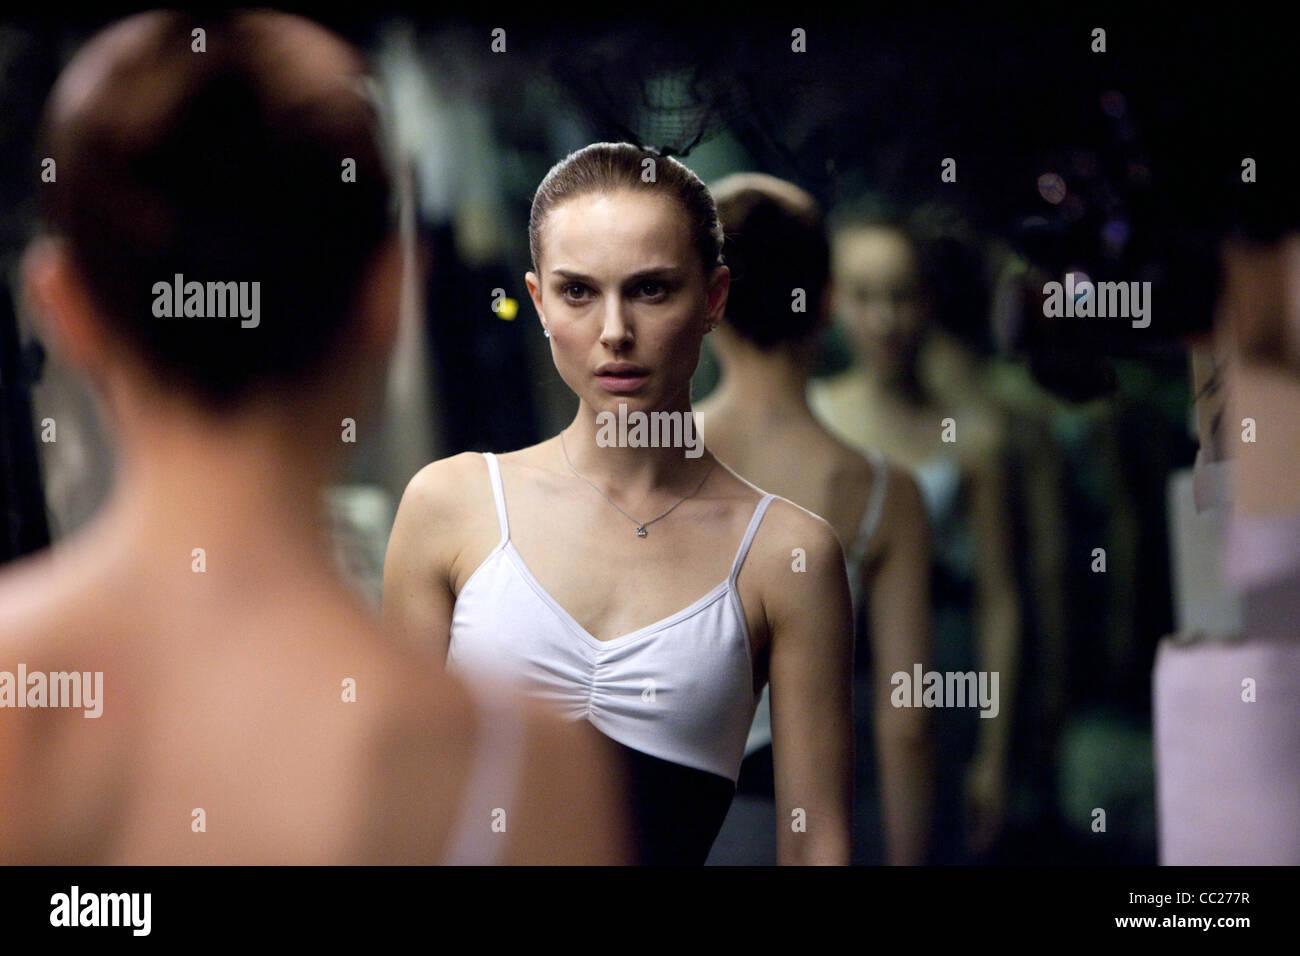 Natalie Portman Black Swan 2010 Stock Photo Alamy